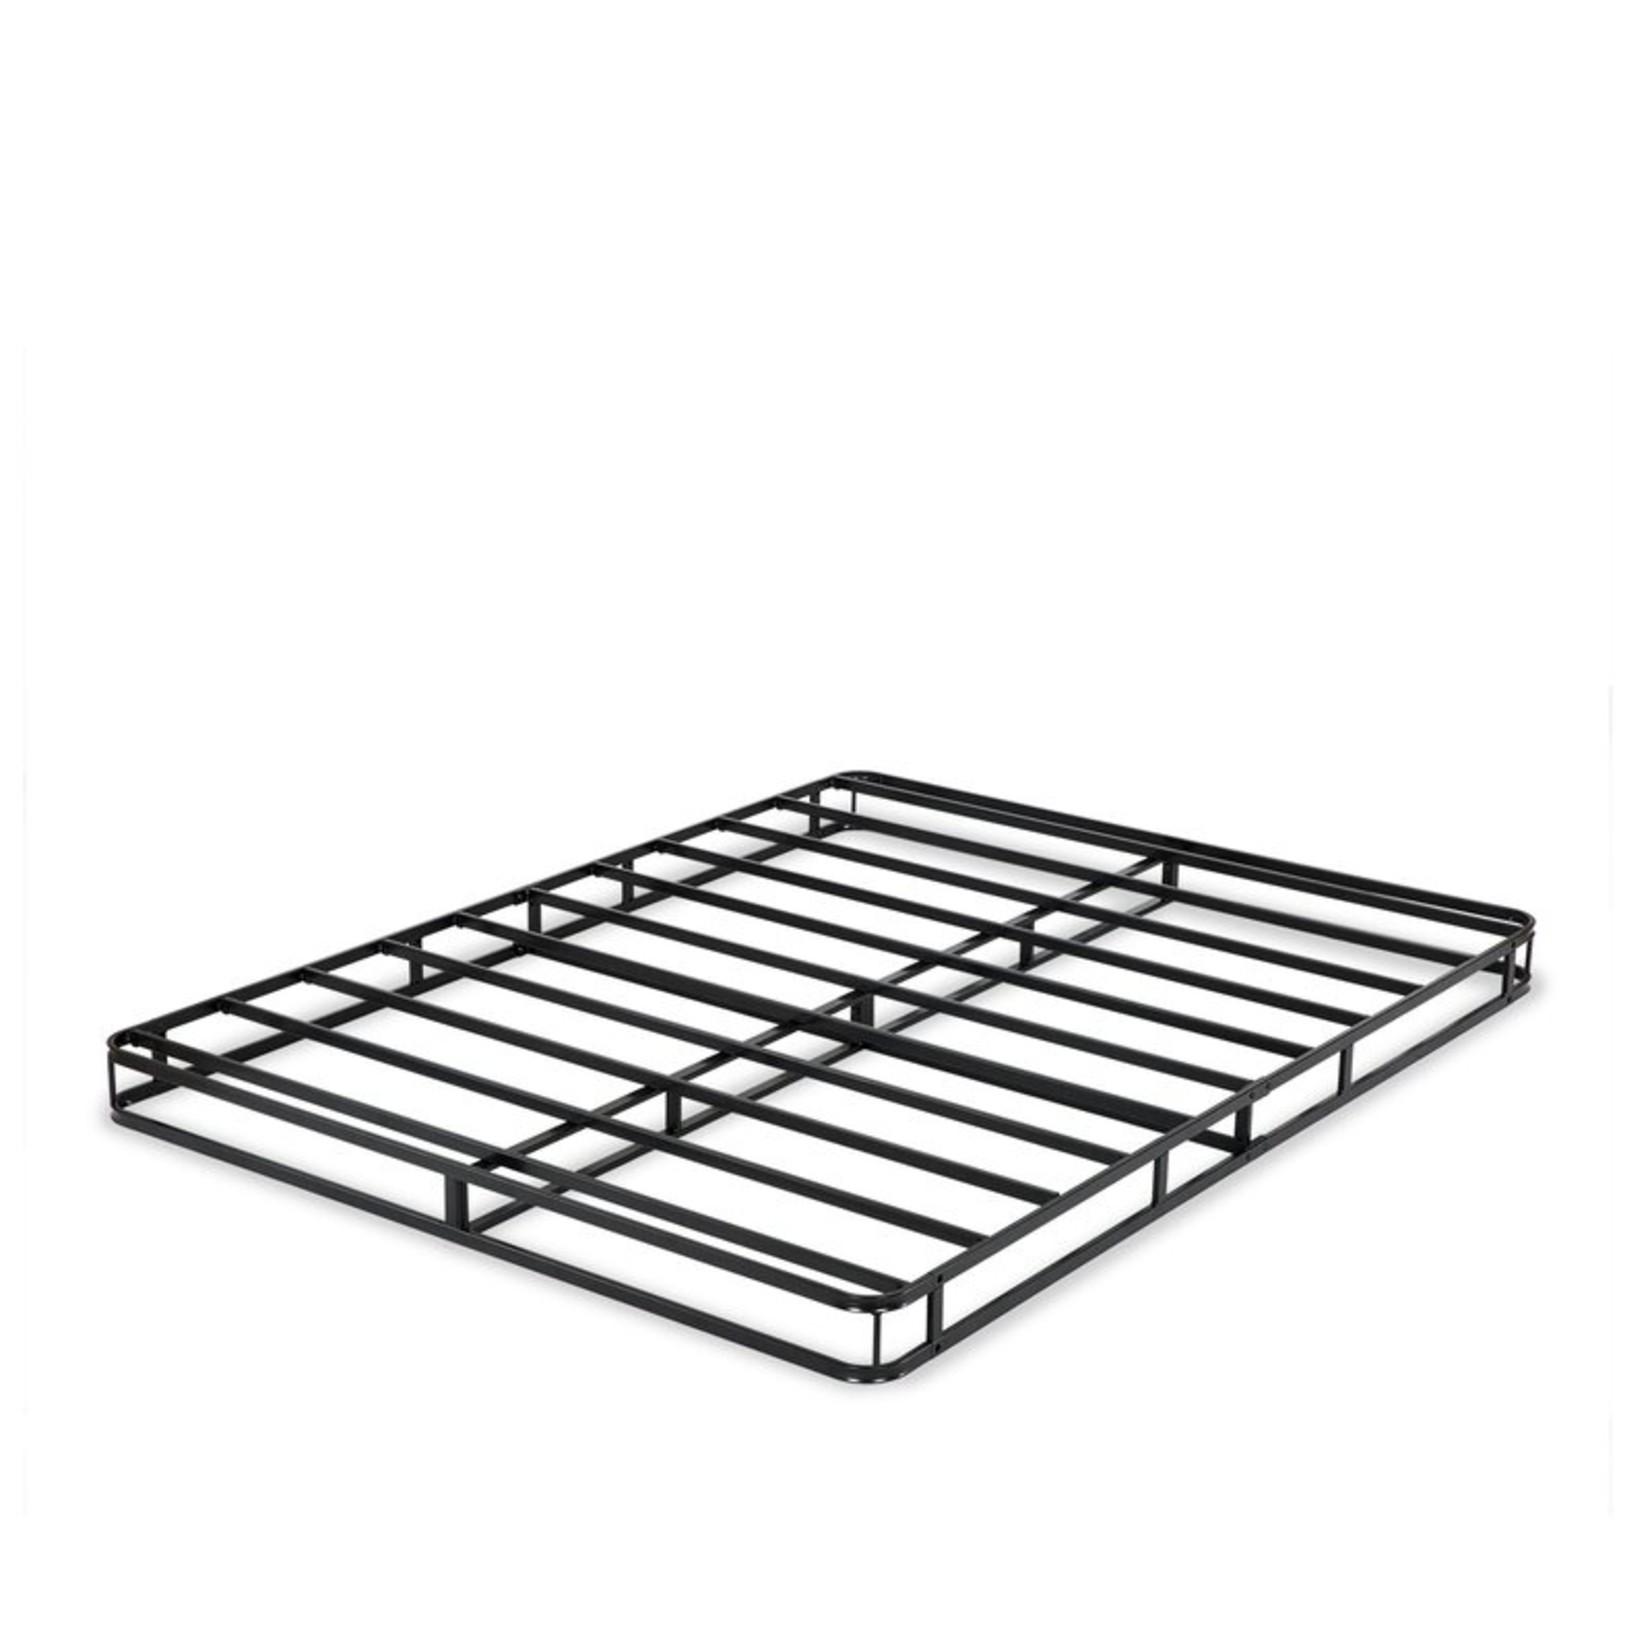 "*Twin - 9"" Wayfair Basics Metal Box Spring"